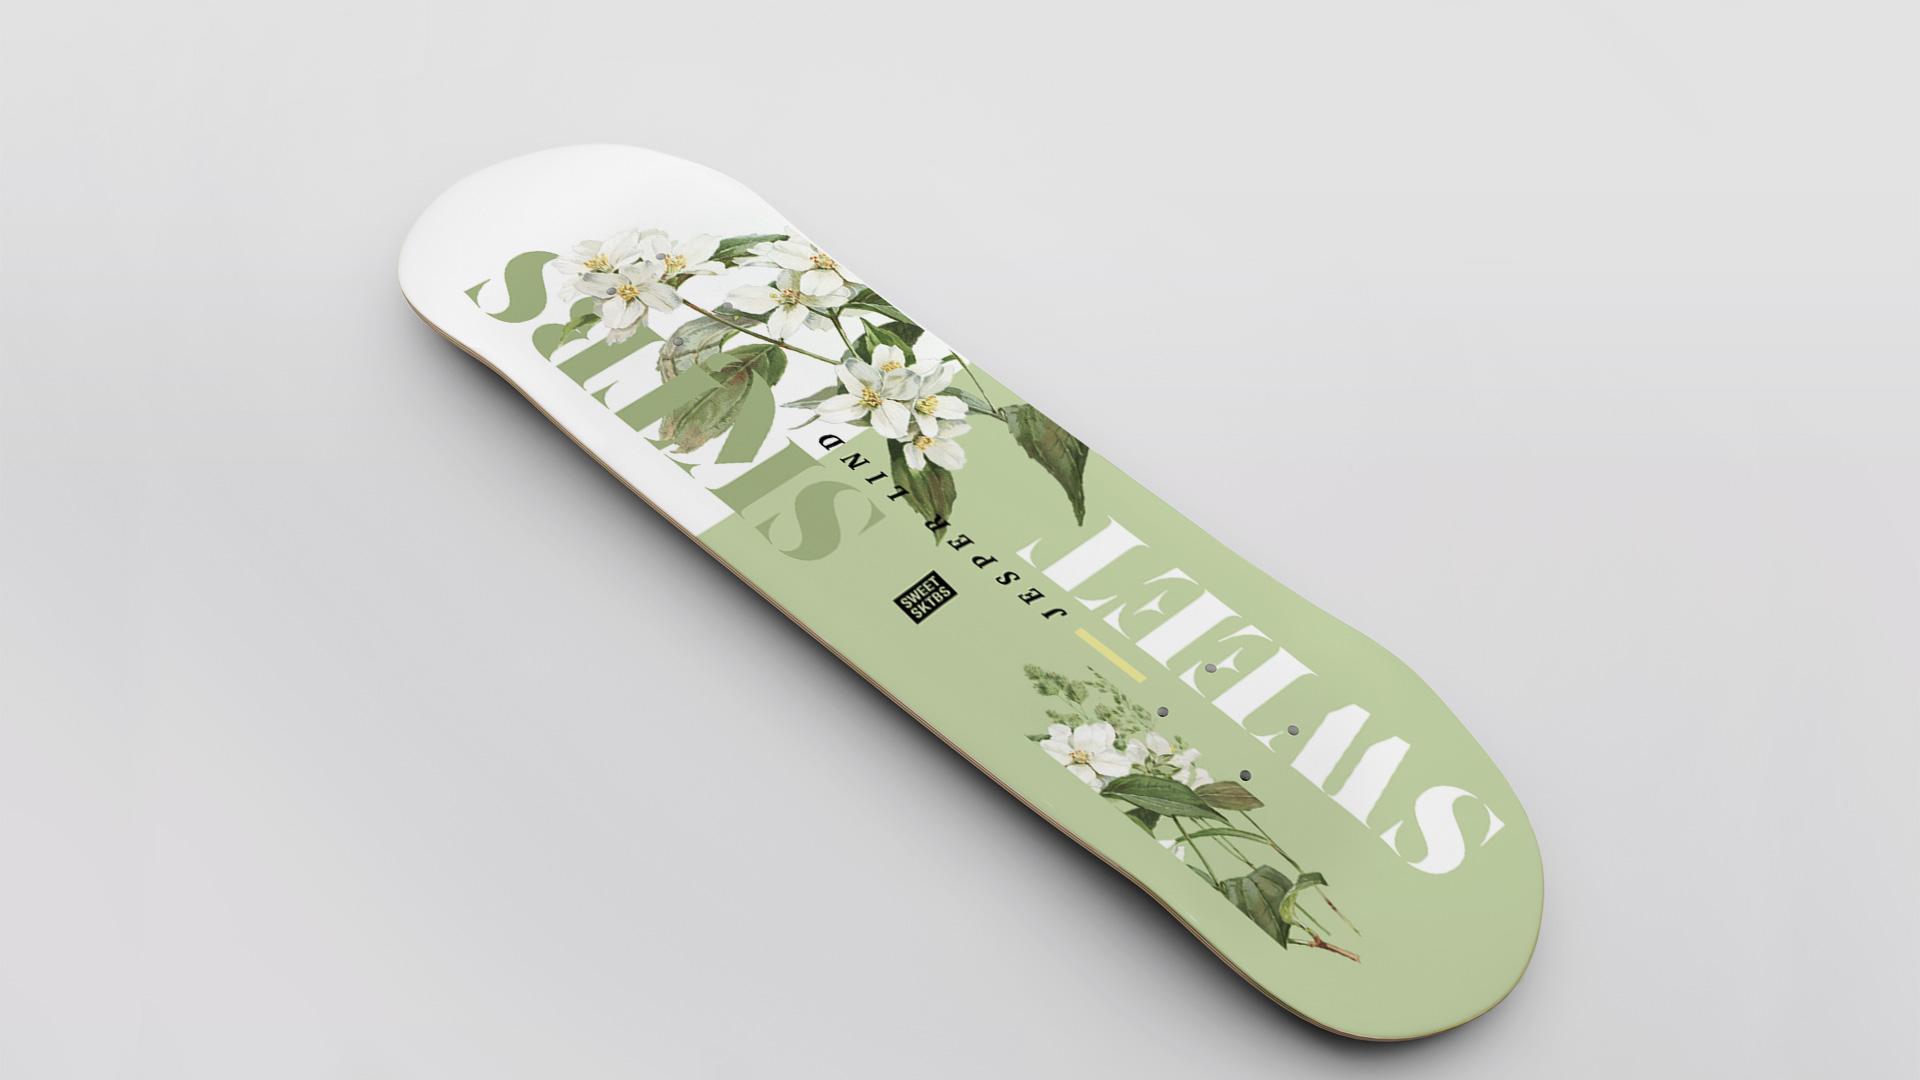 5_deck_skateboards_graphicdesign